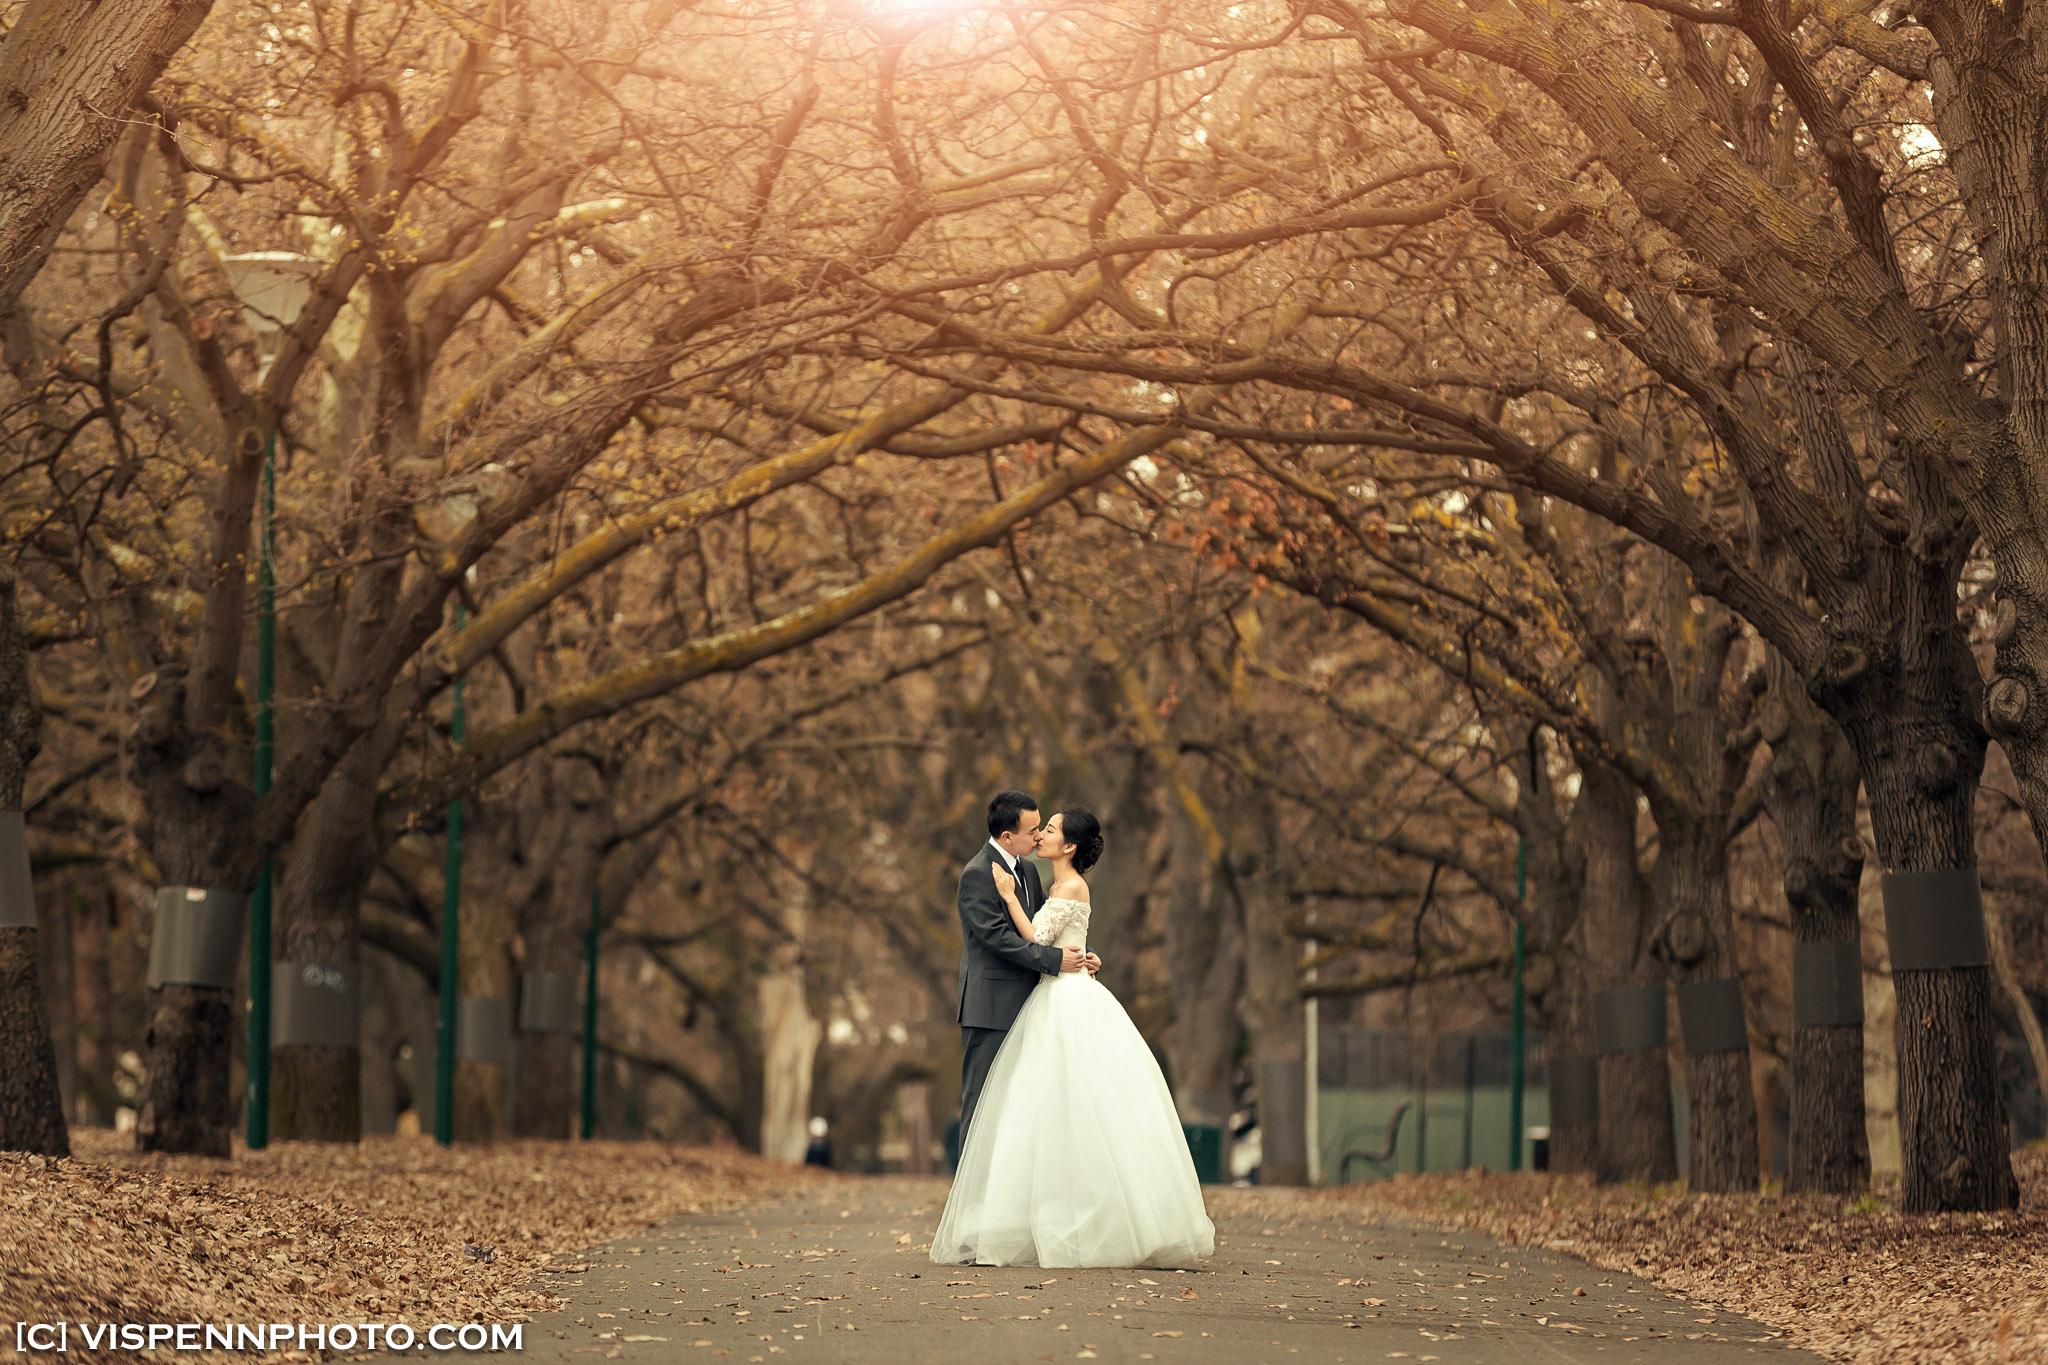 PRE WEDDING Photography Melbourne VISPENN 墨尔本 婚纱照 结婚照 婚纱摄影 VISPENN XXD 0055